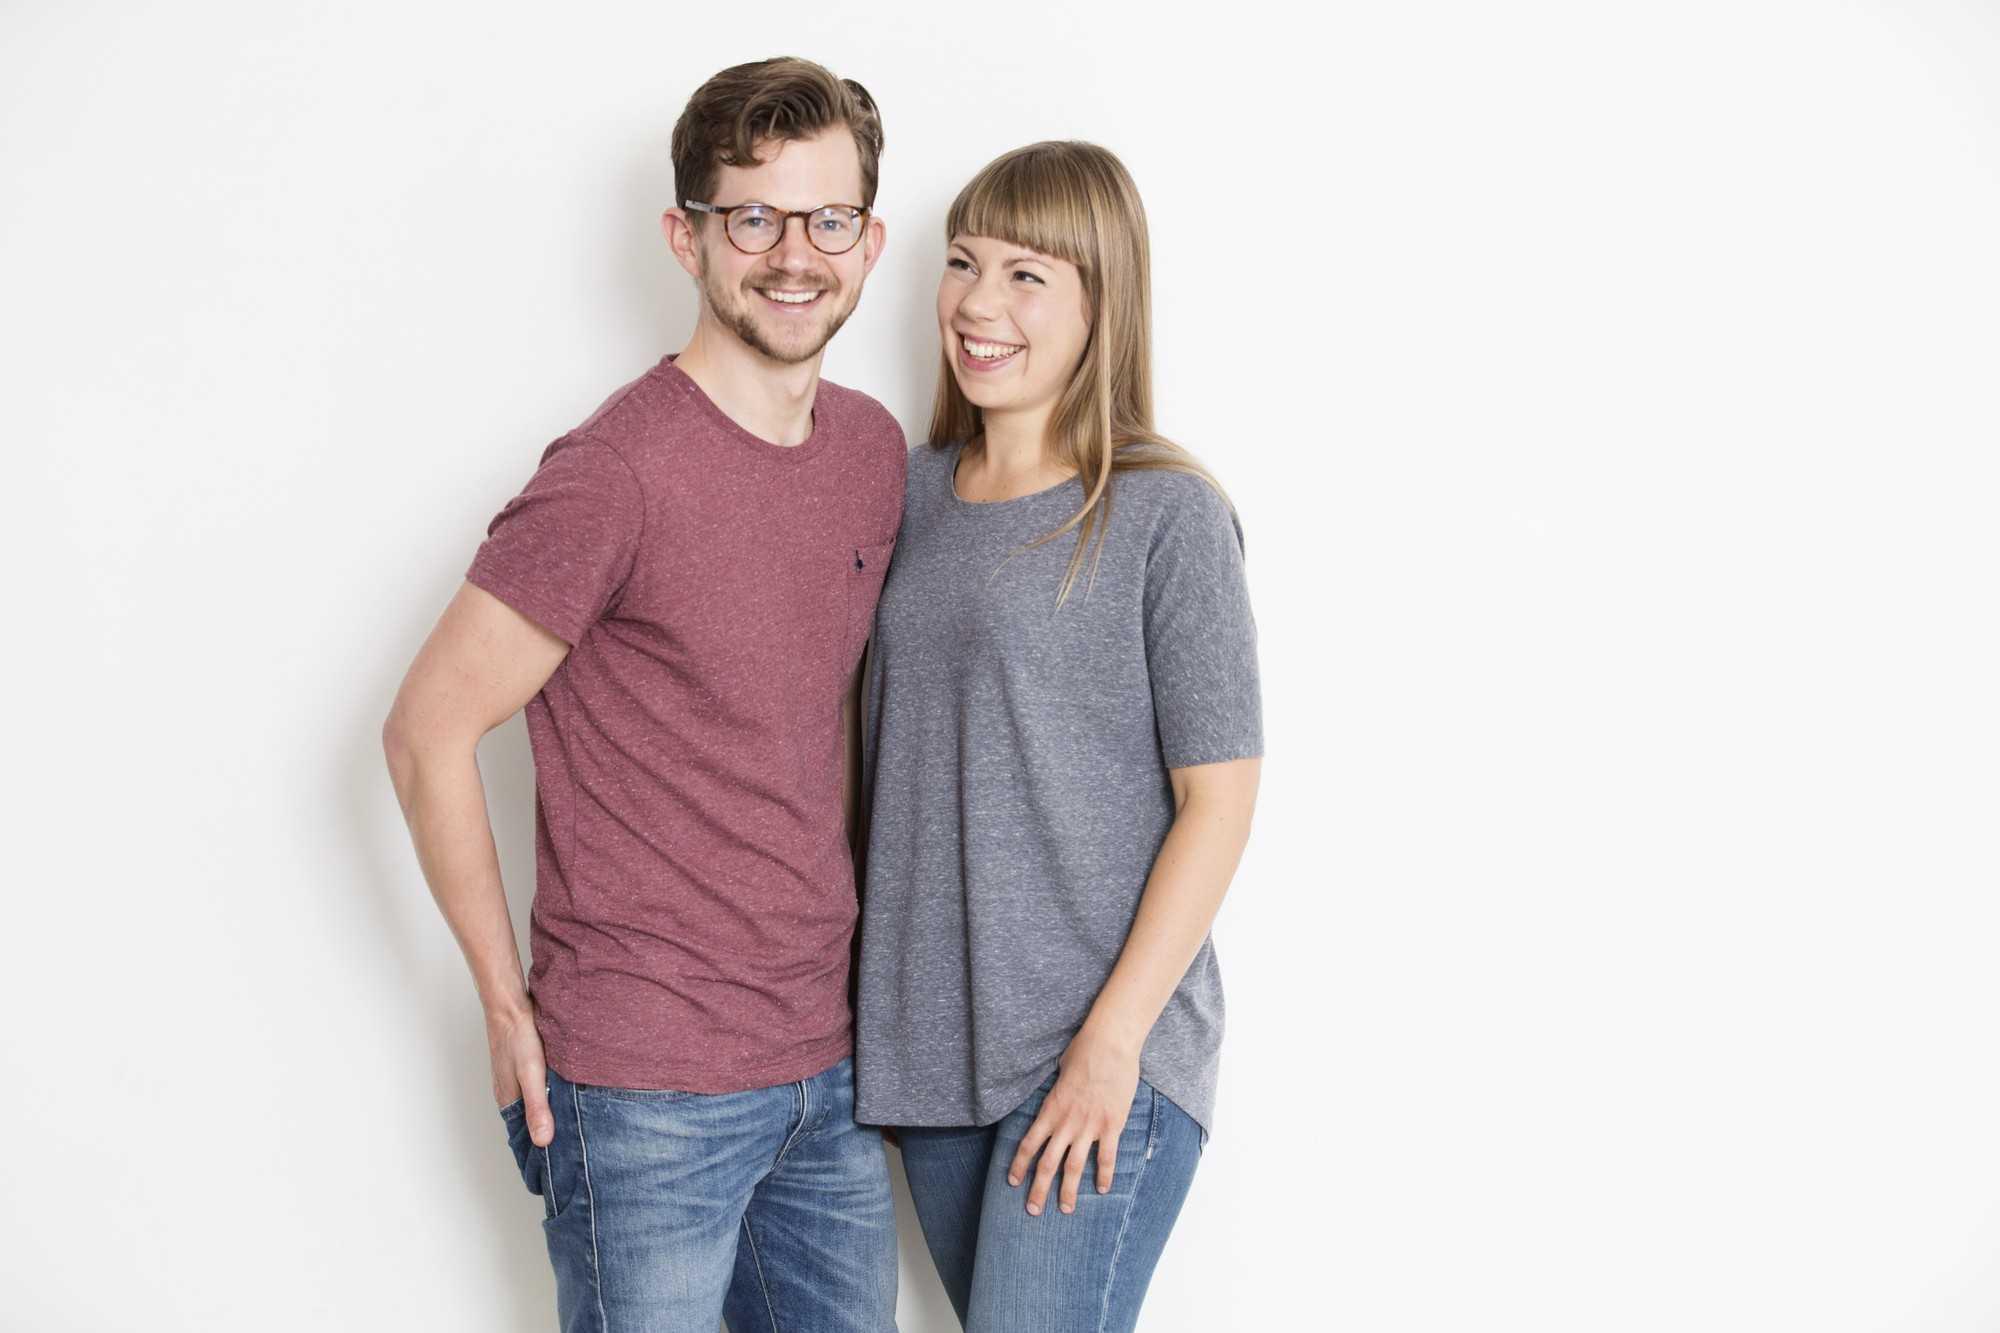 ALL GOOD - Julie Van den Kerchove en Simon Matthys